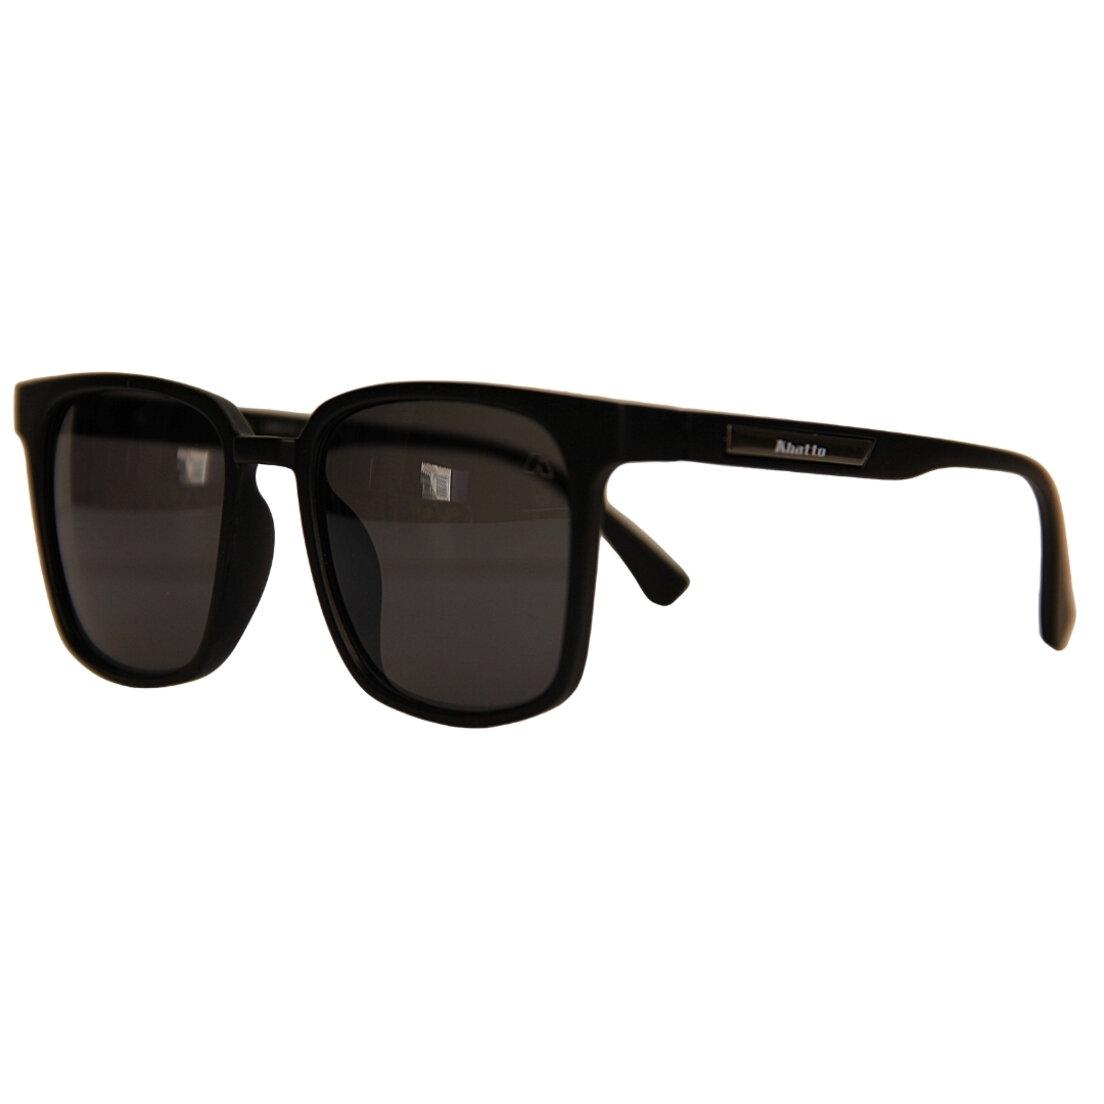 OUTLET - Óculos de Sol Khatto Square Genderless Italiano